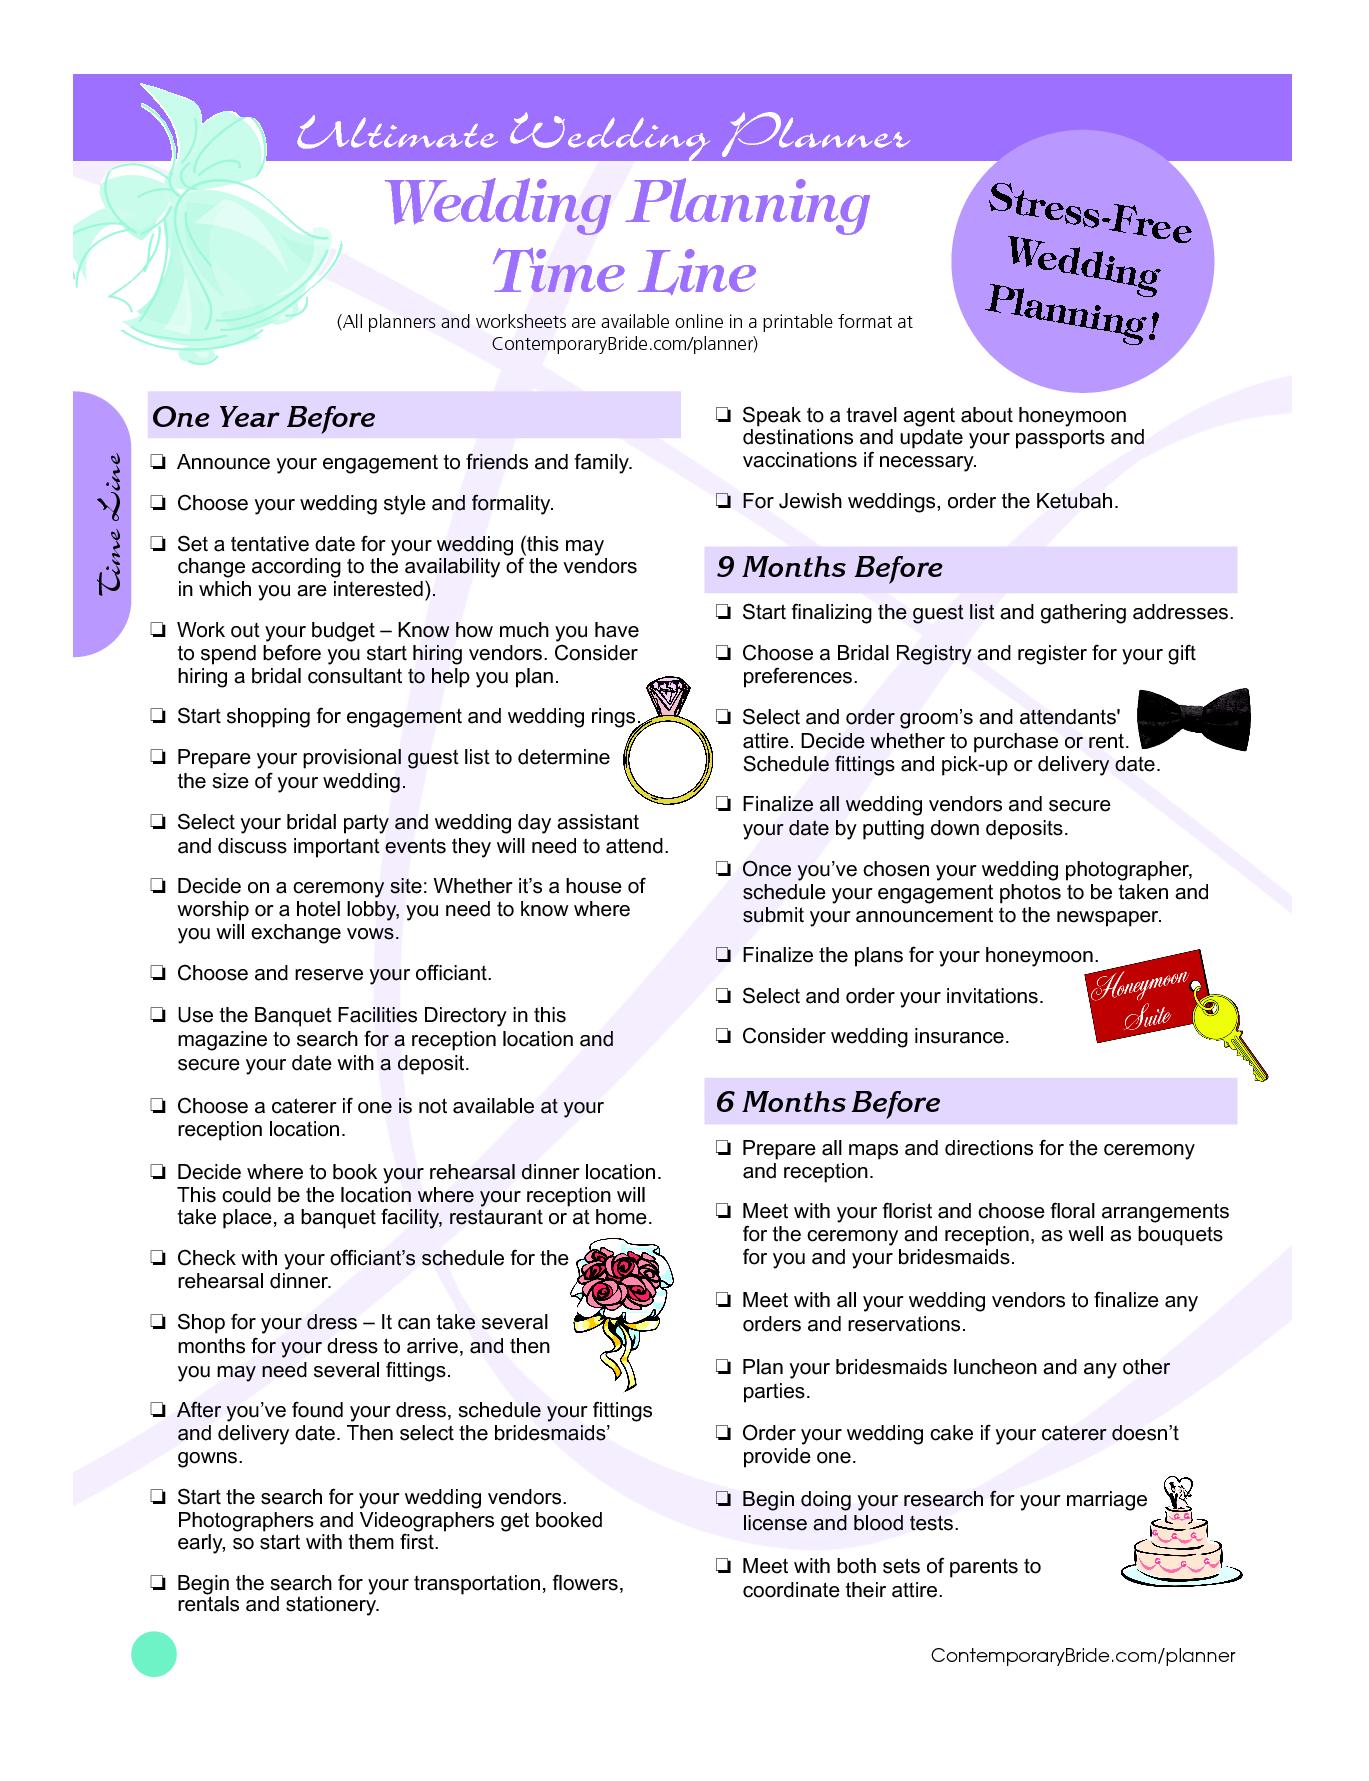 Free Printable Wedding Planning Timeline